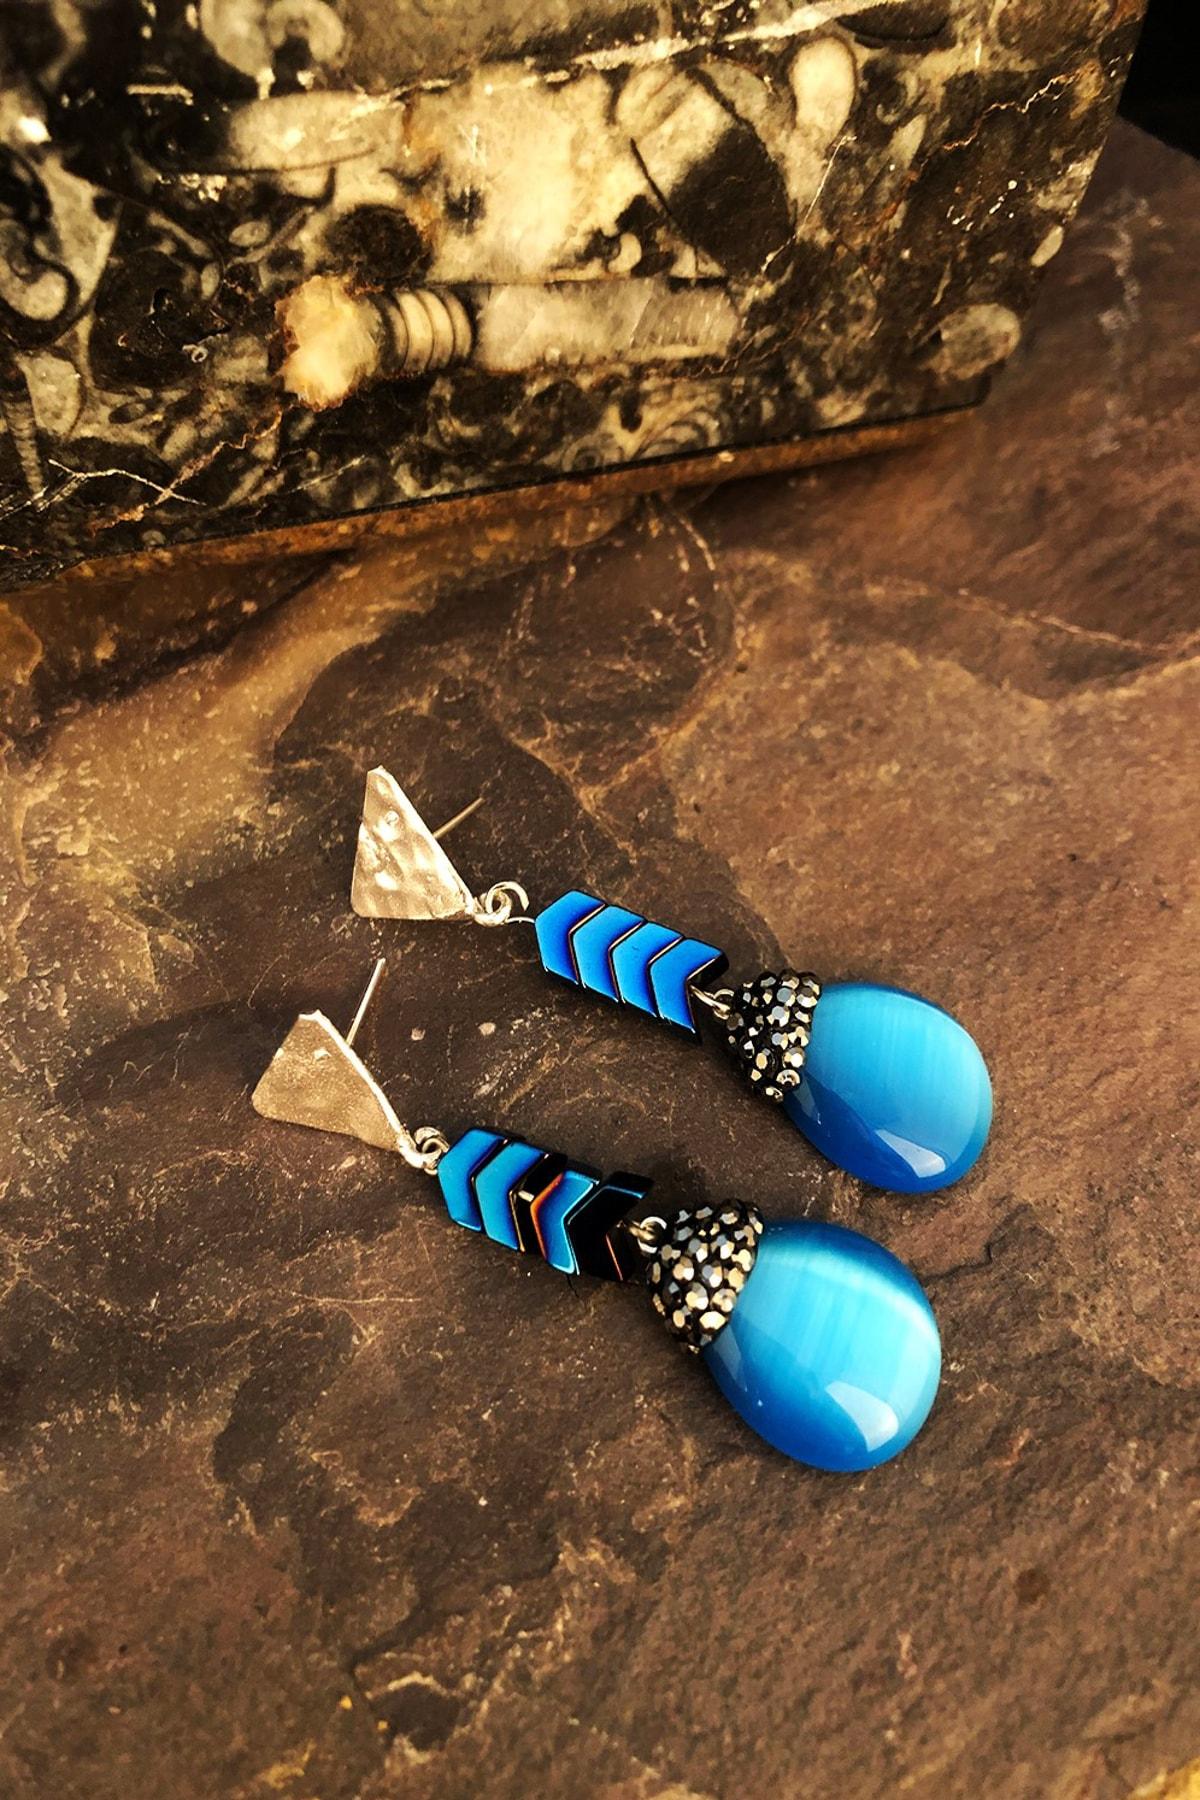 Dr. Stone Doğaltaş Kadın Kedigözü Taşı Gümüş Kaplama Küpe Ryl13 1